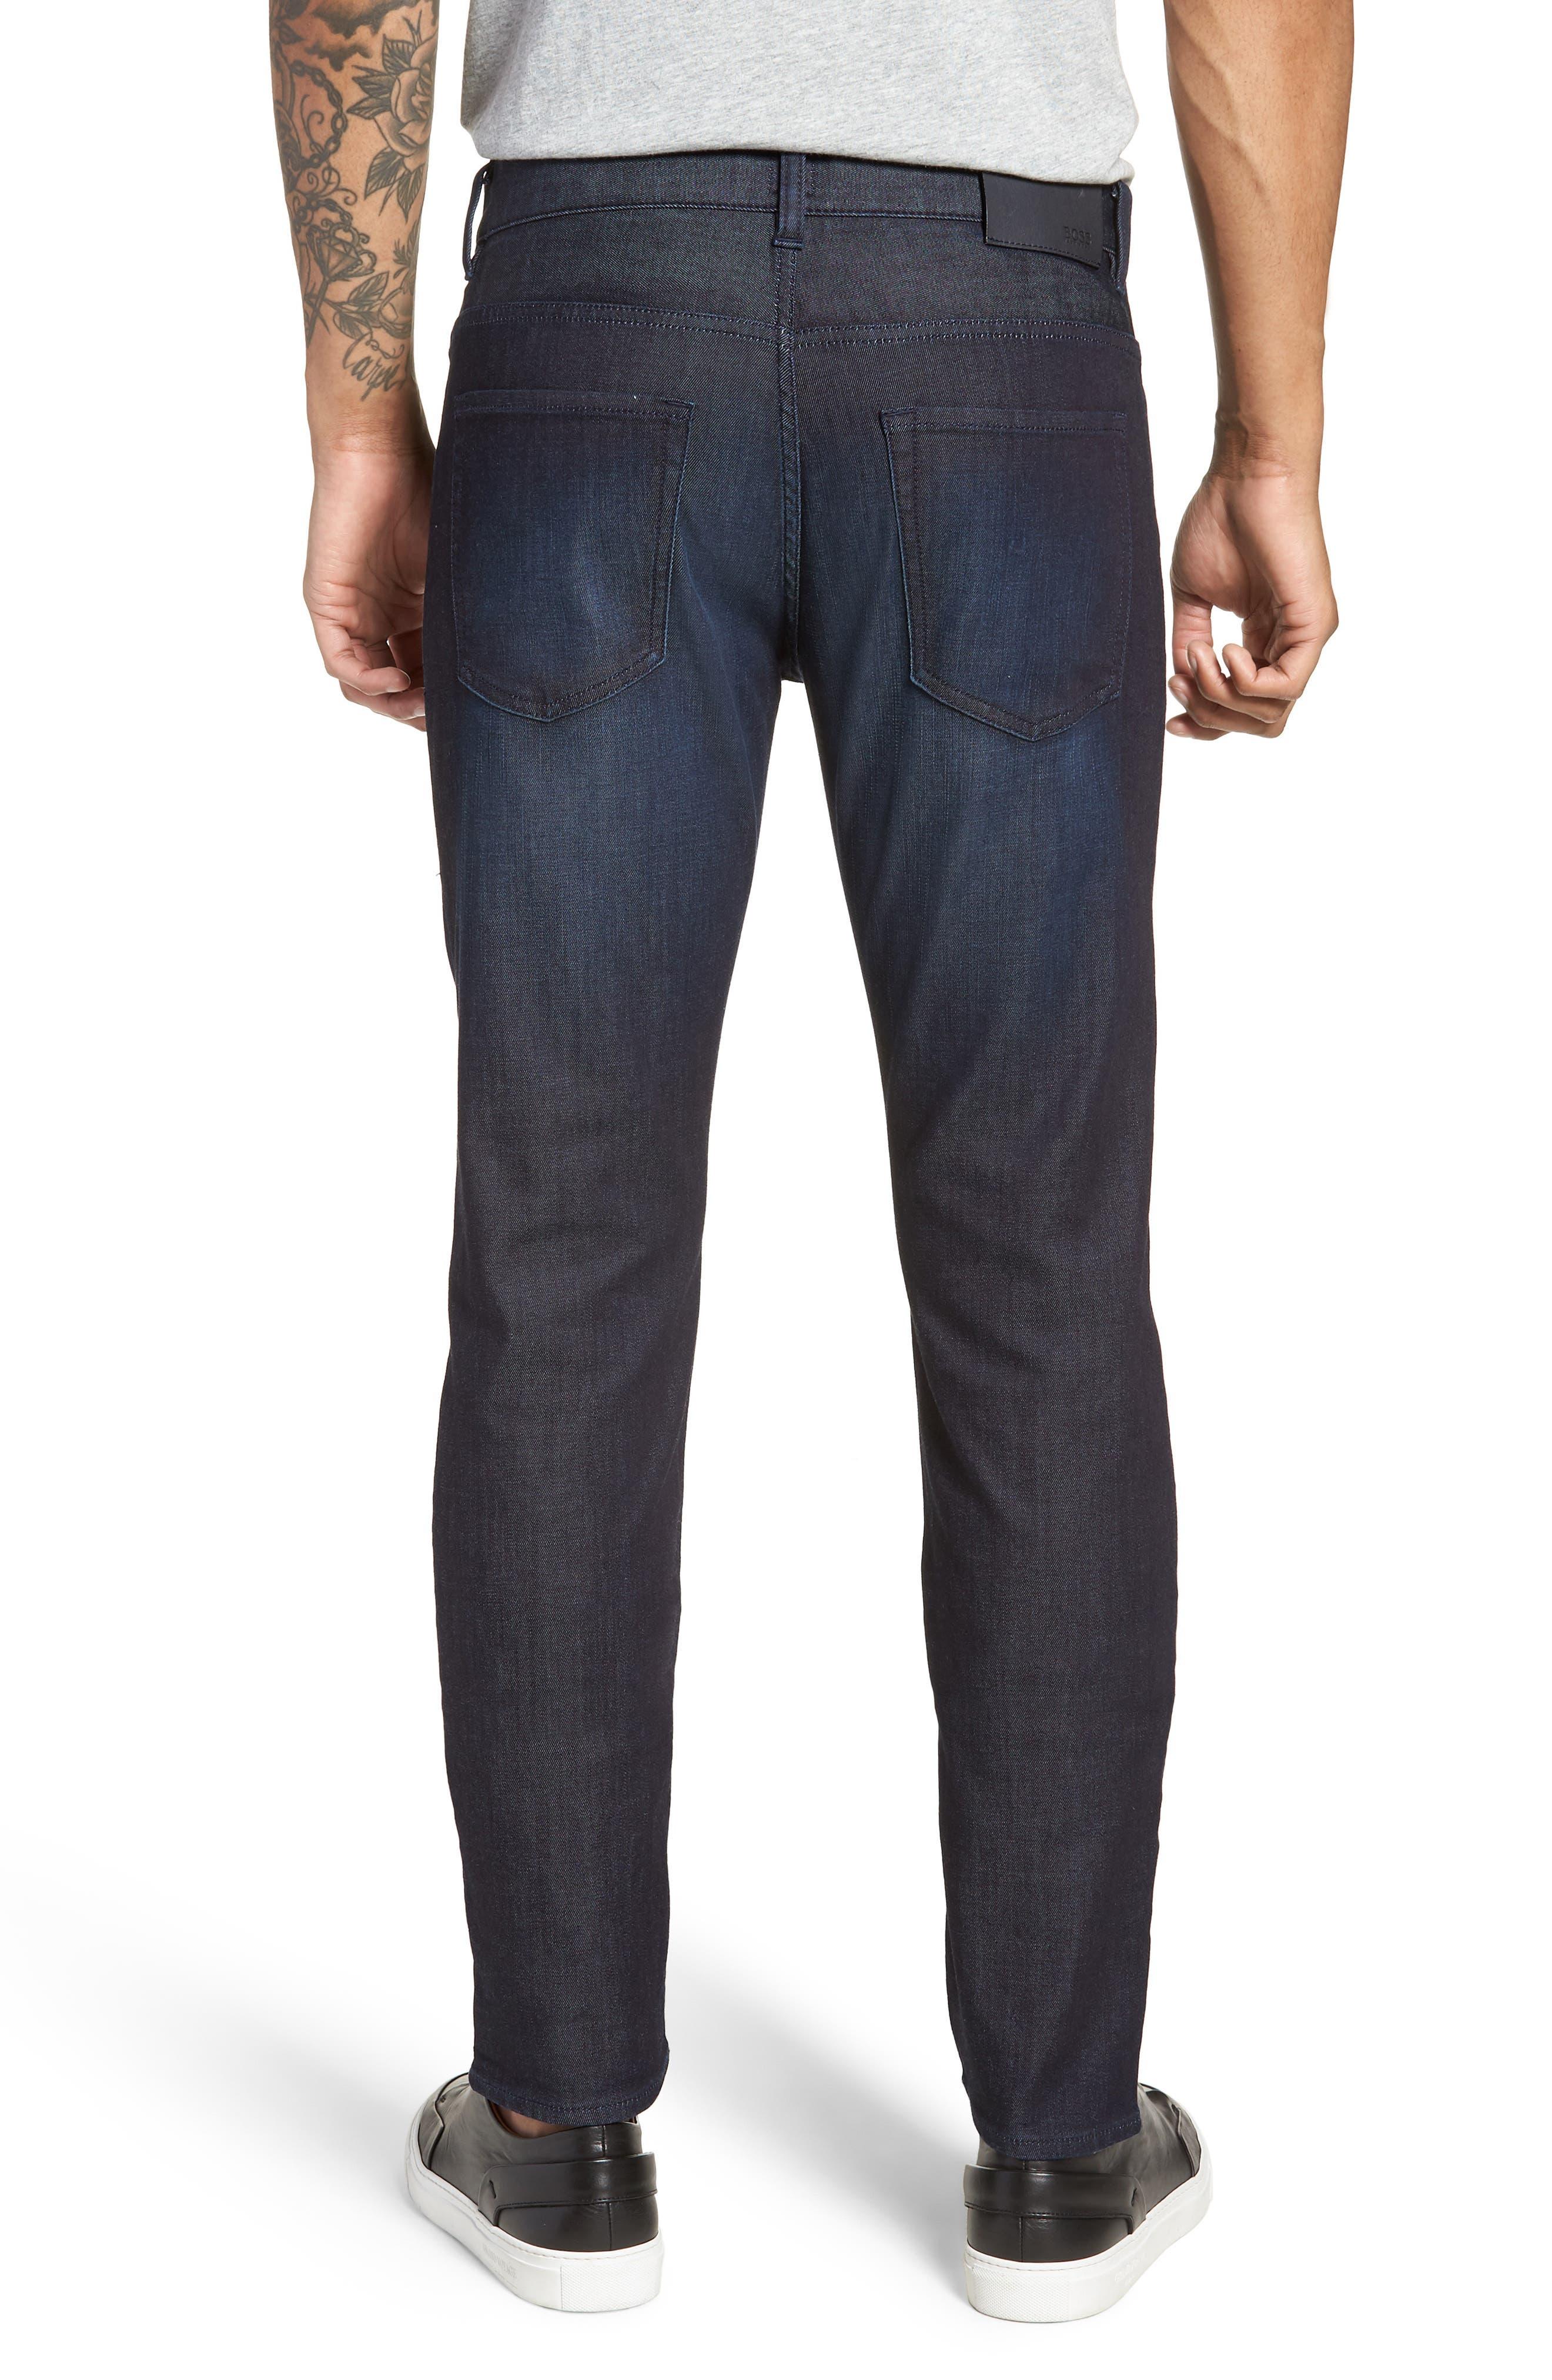 Delaware Slim Fit Jeans,                             Alternate thumbnail 2, color,